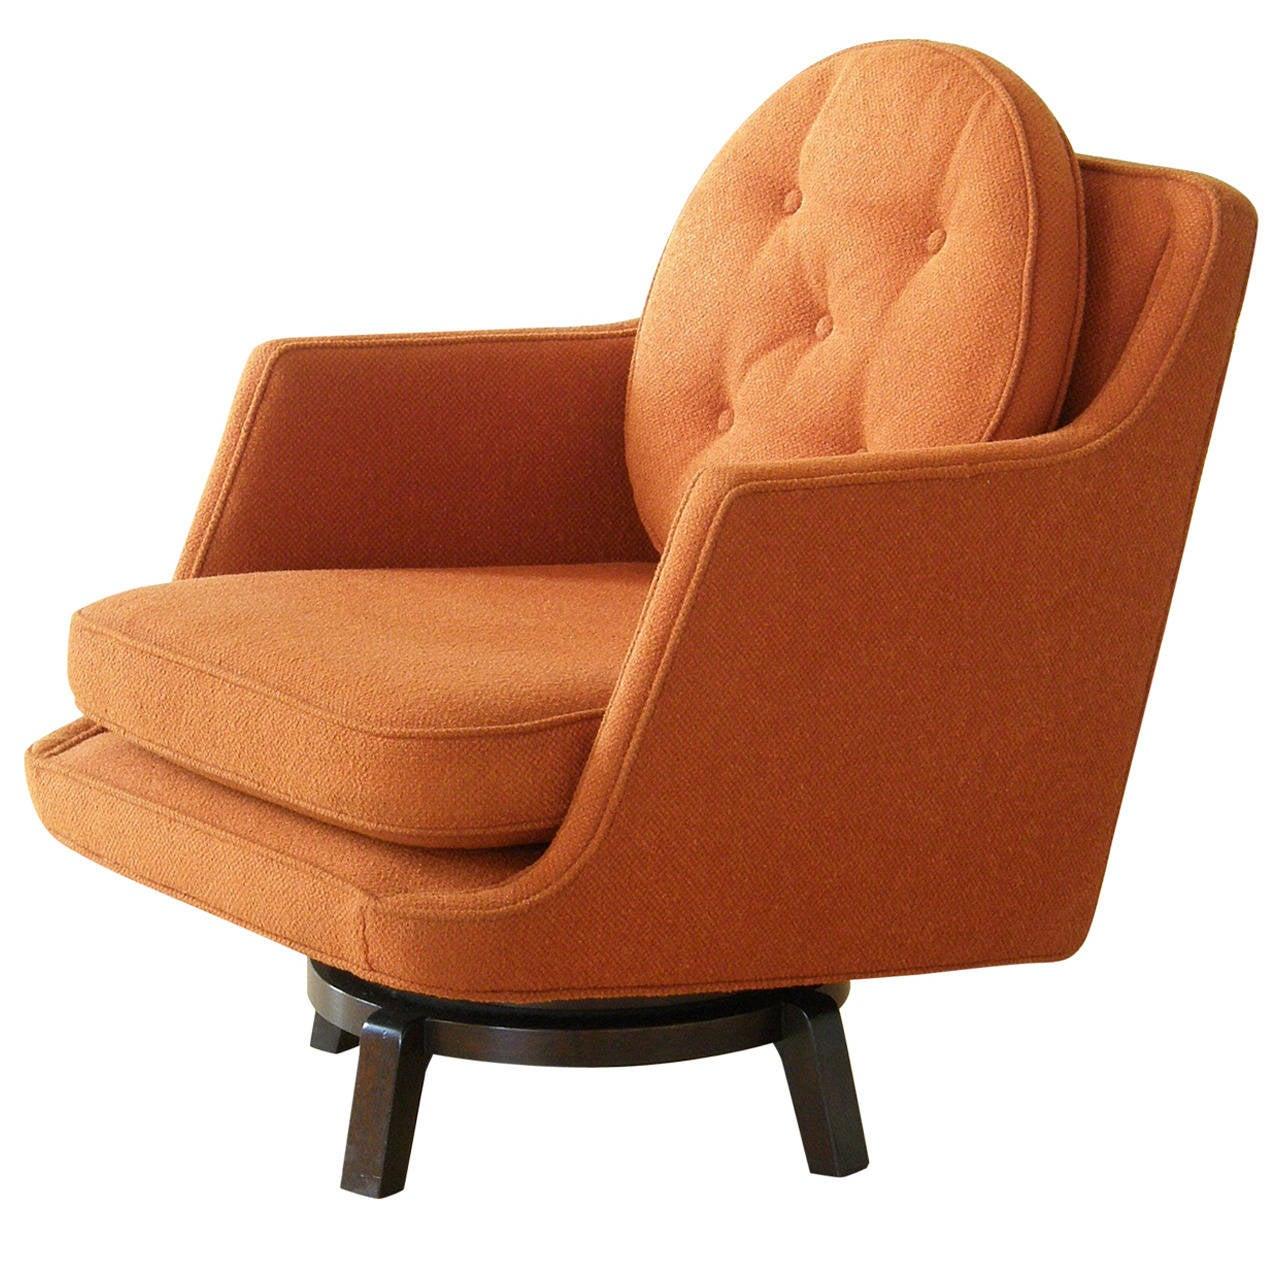 Edward wormley for dunbar swivel lounge chair at 1stdibs - Edward wormley chairs ...